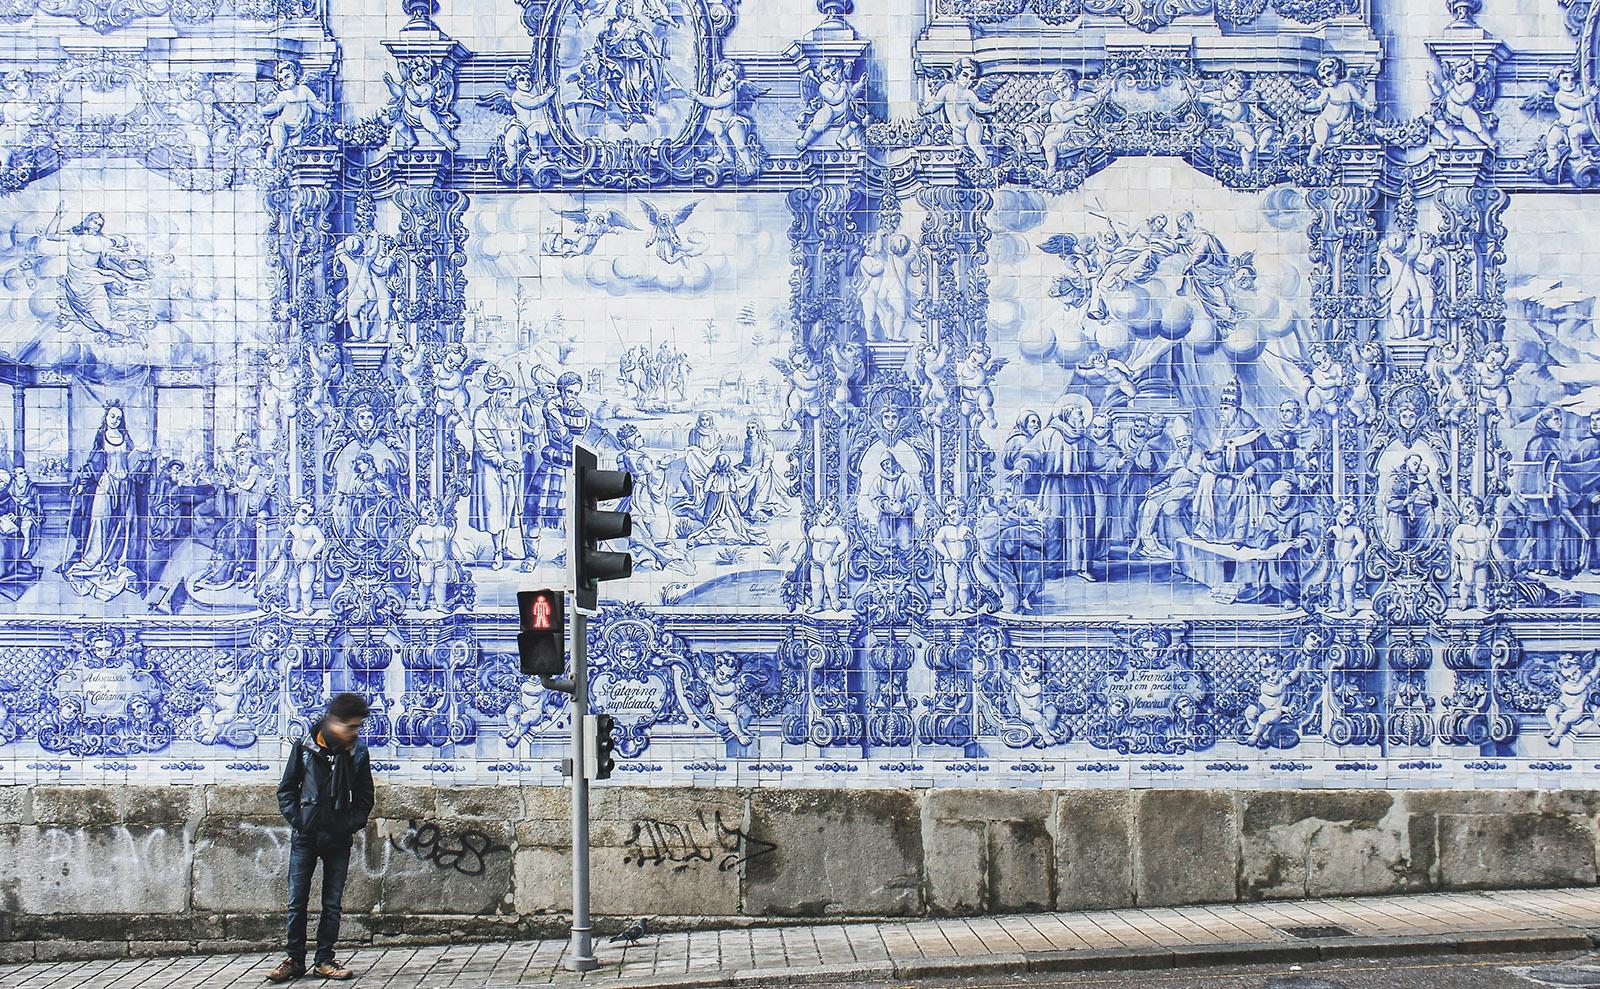 Lit in Translation, Azulejos Tiles, Magic Books, Dracula & More: Endnotes 18 September